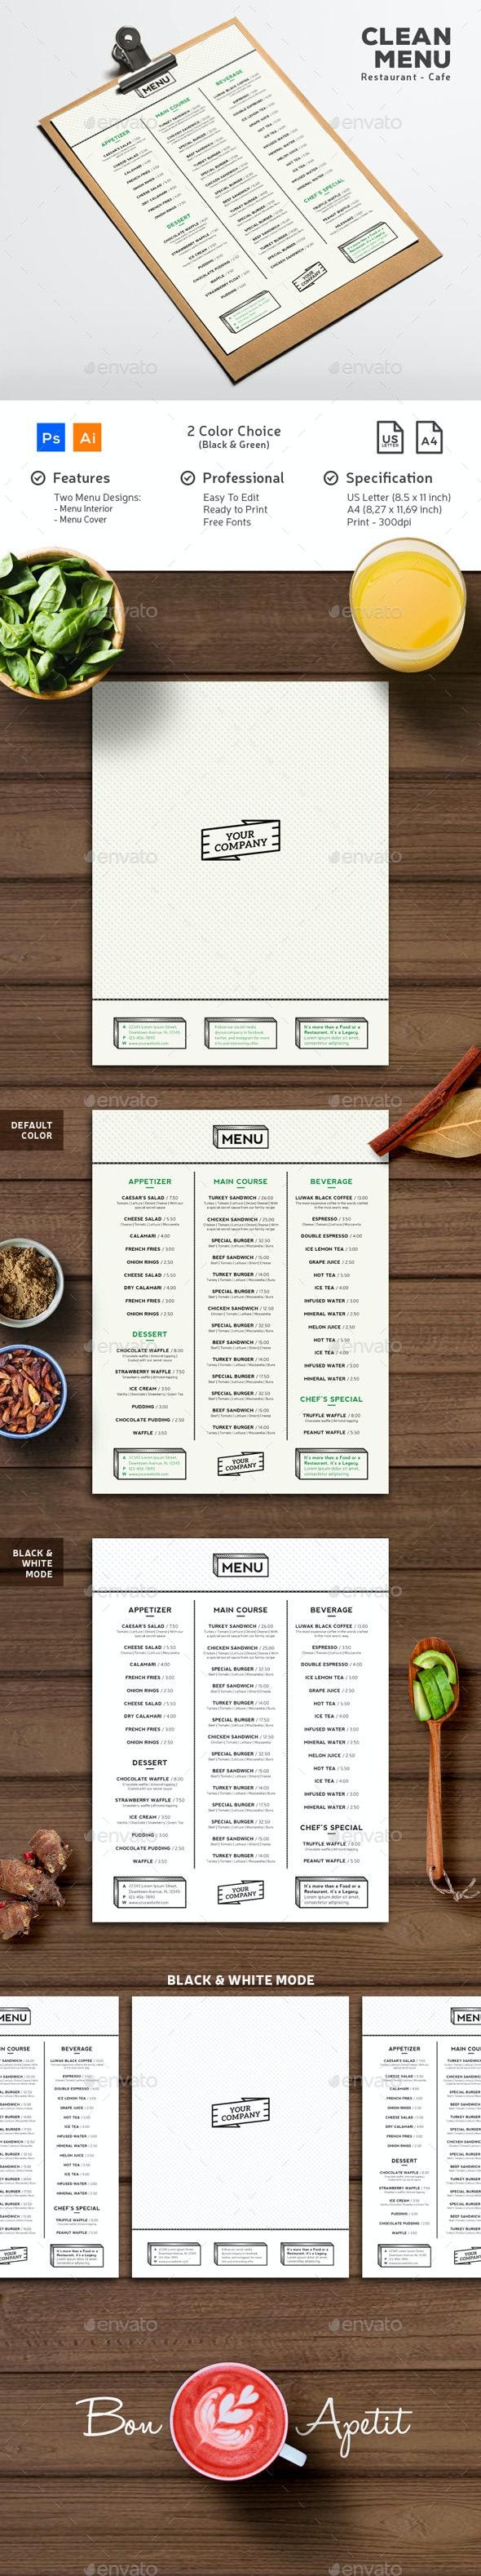 Clean Minimalist Menu - Food Menus Print Templates